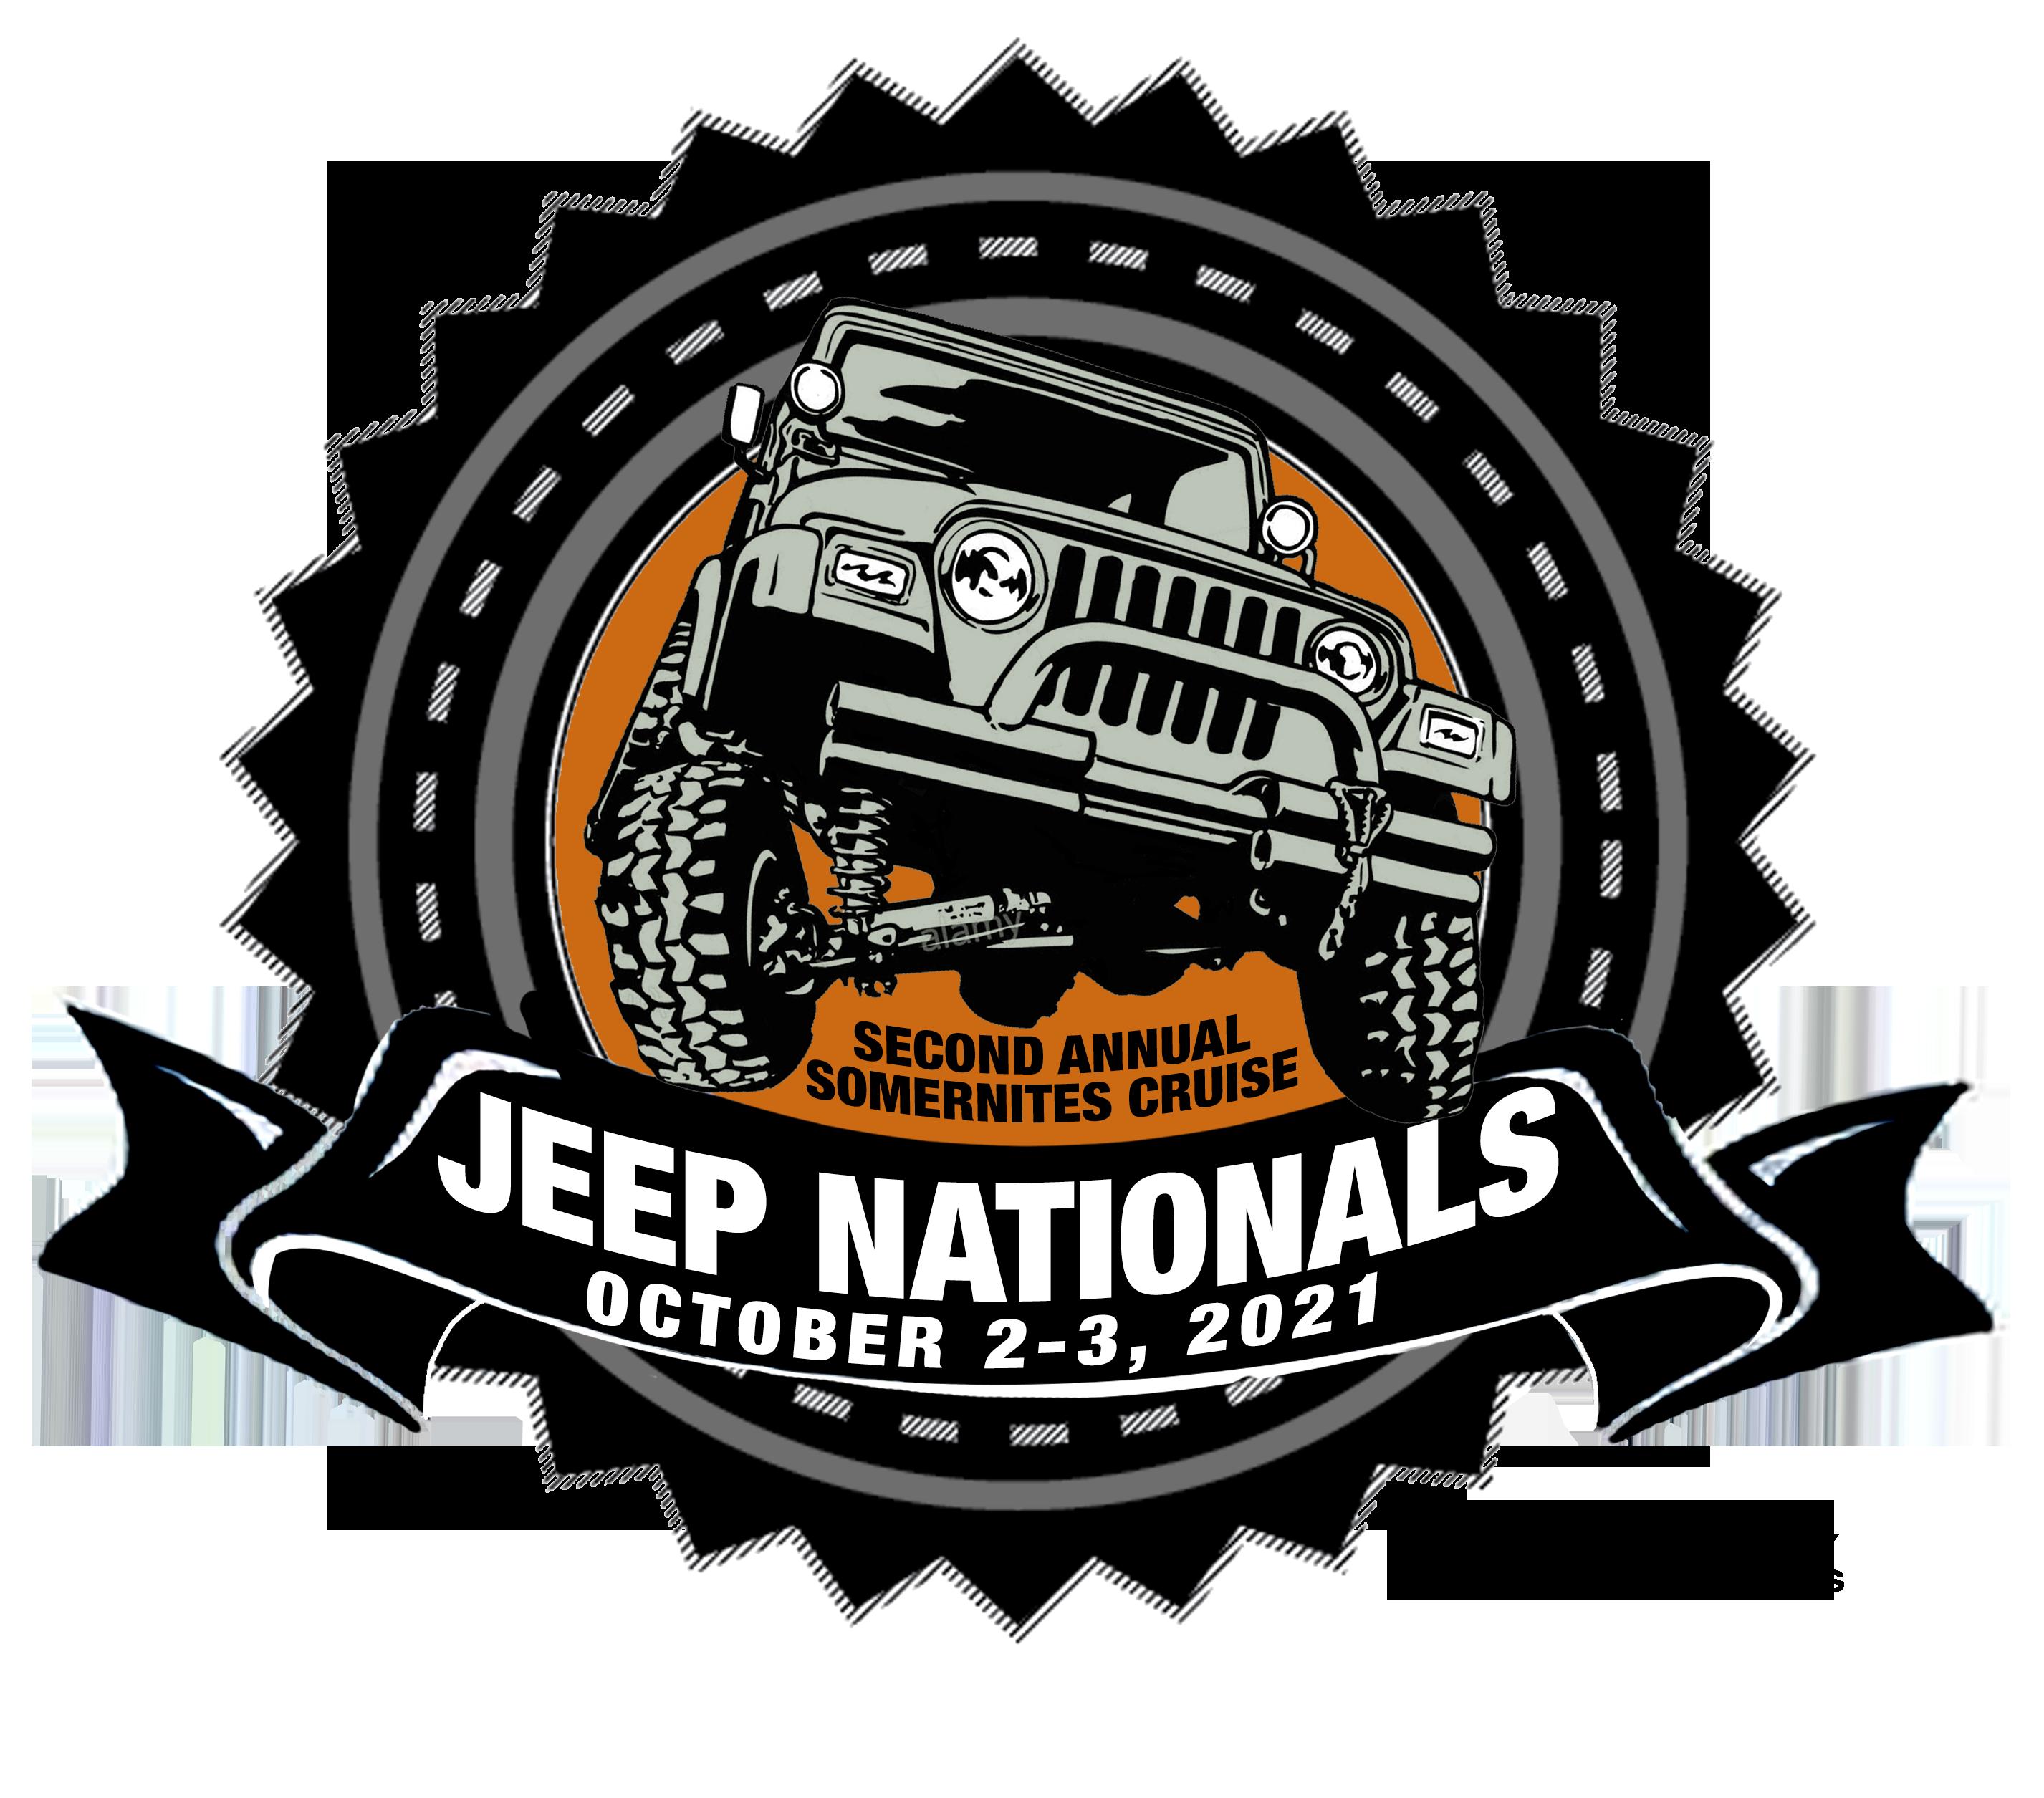 jeepnationals2021logo